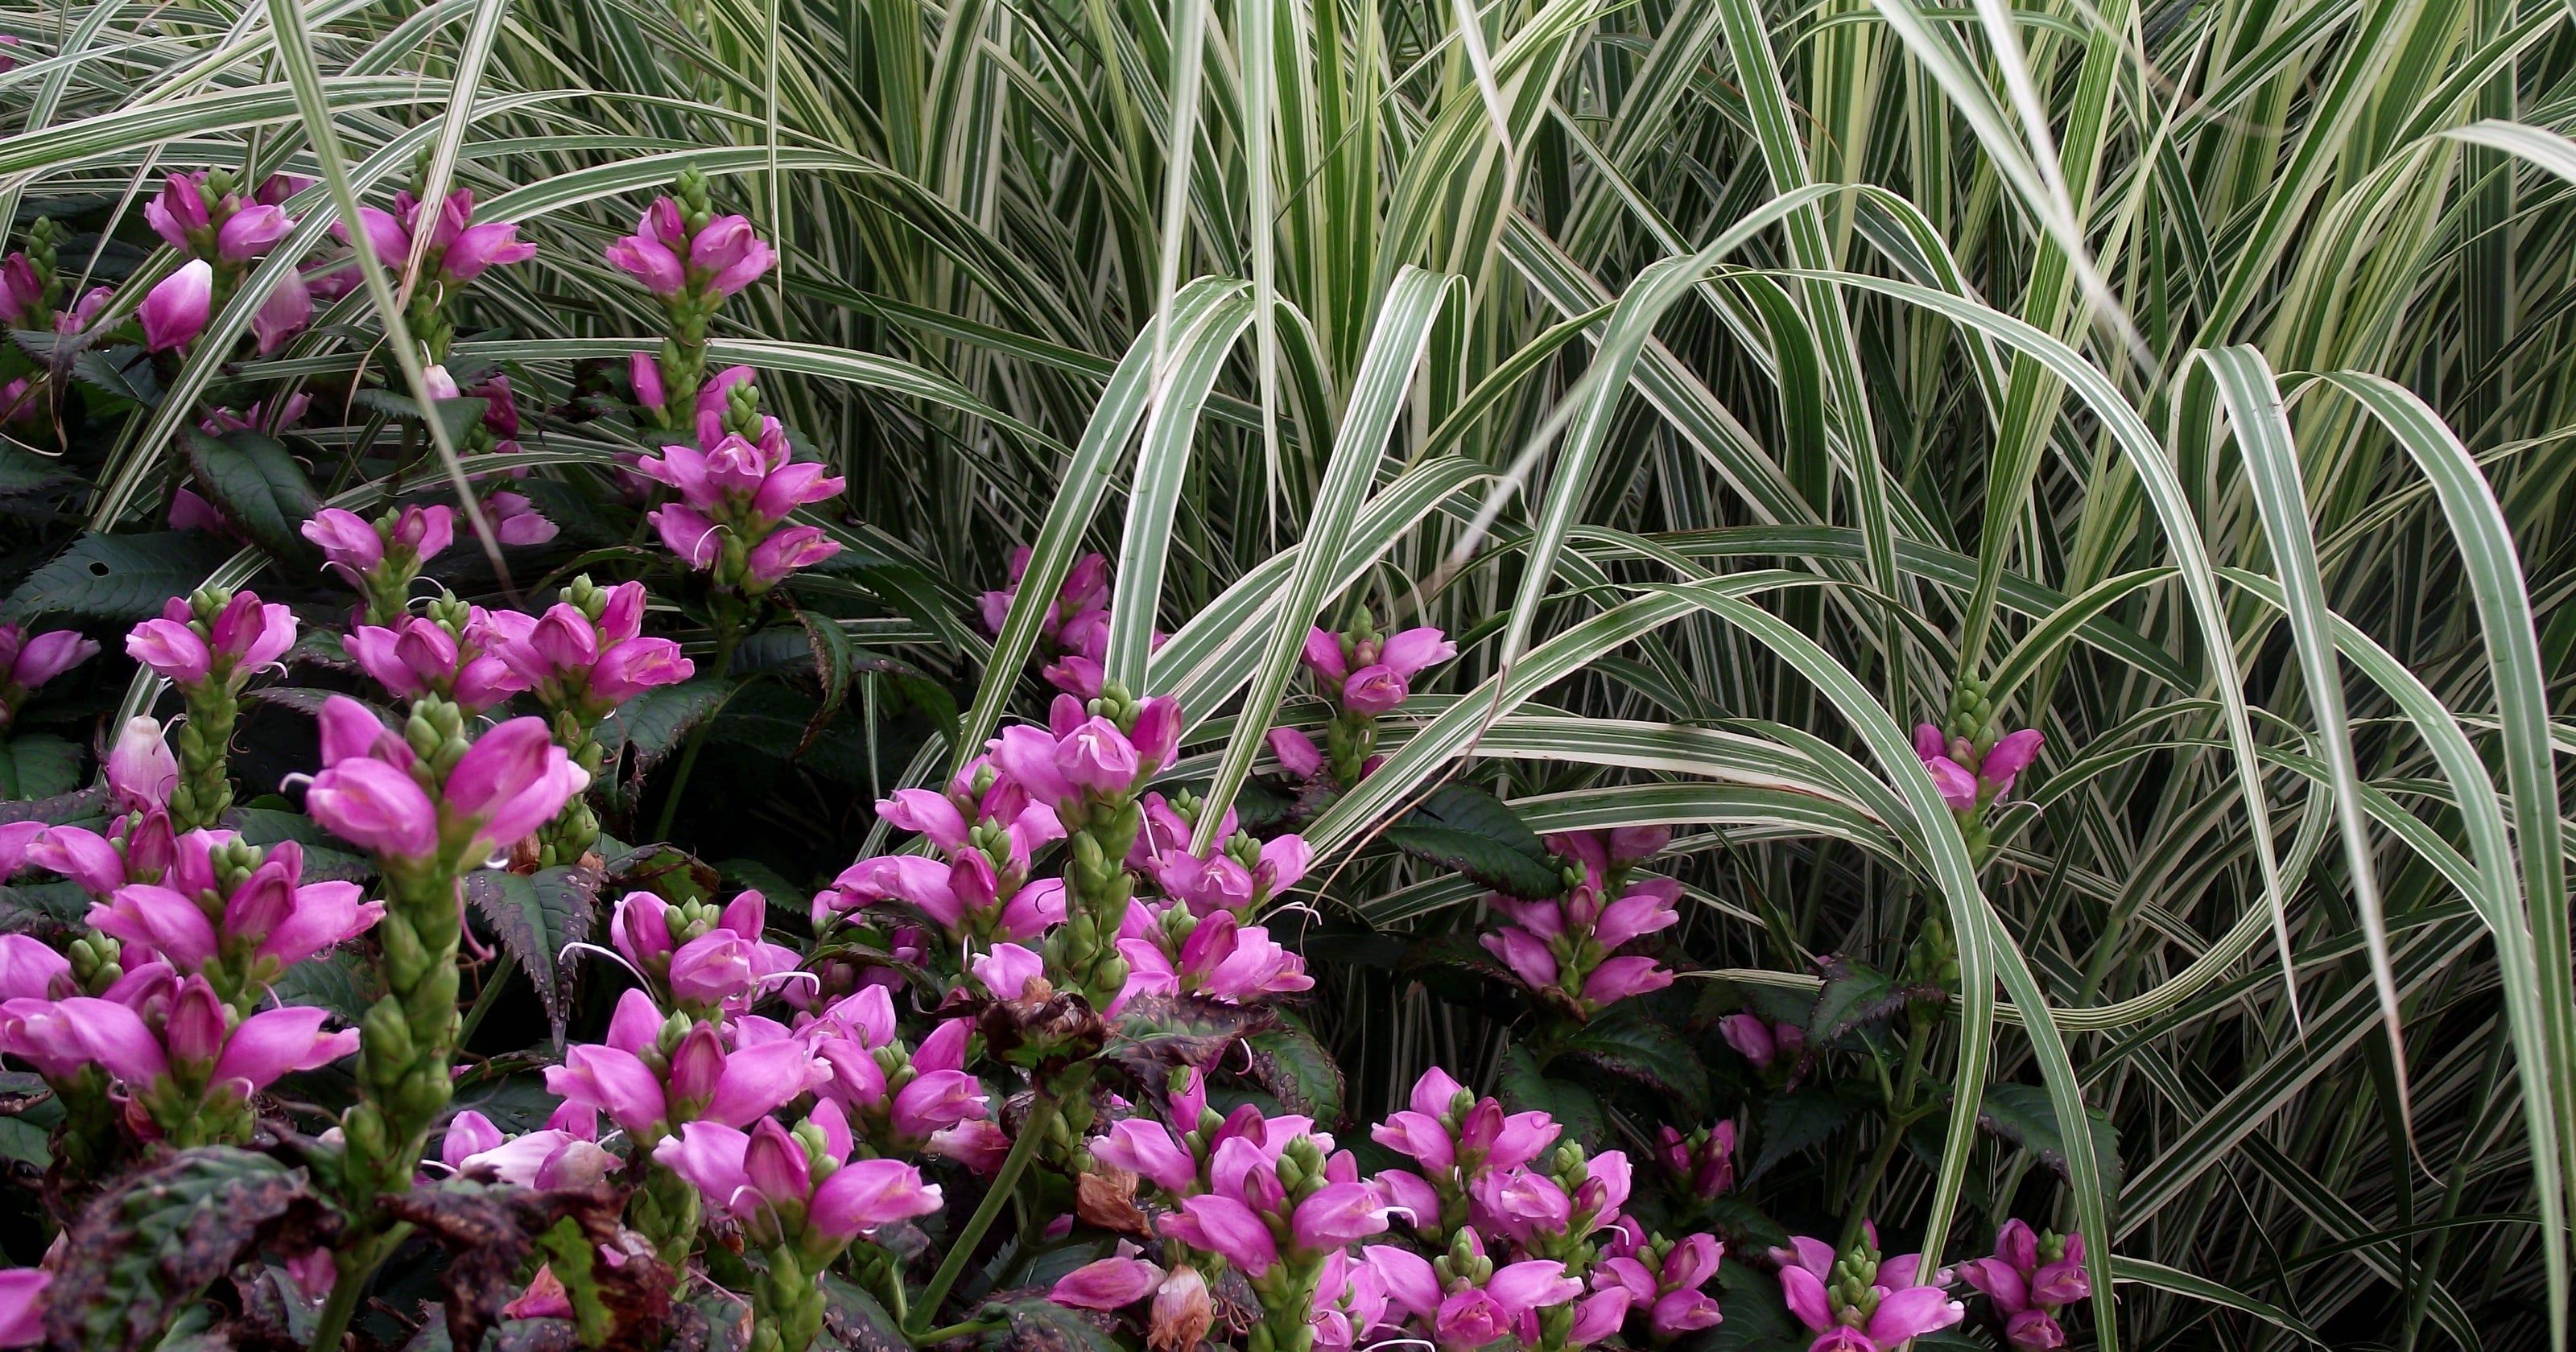 Yard Md Ornamental Grasses Provide Spectacular Beauty